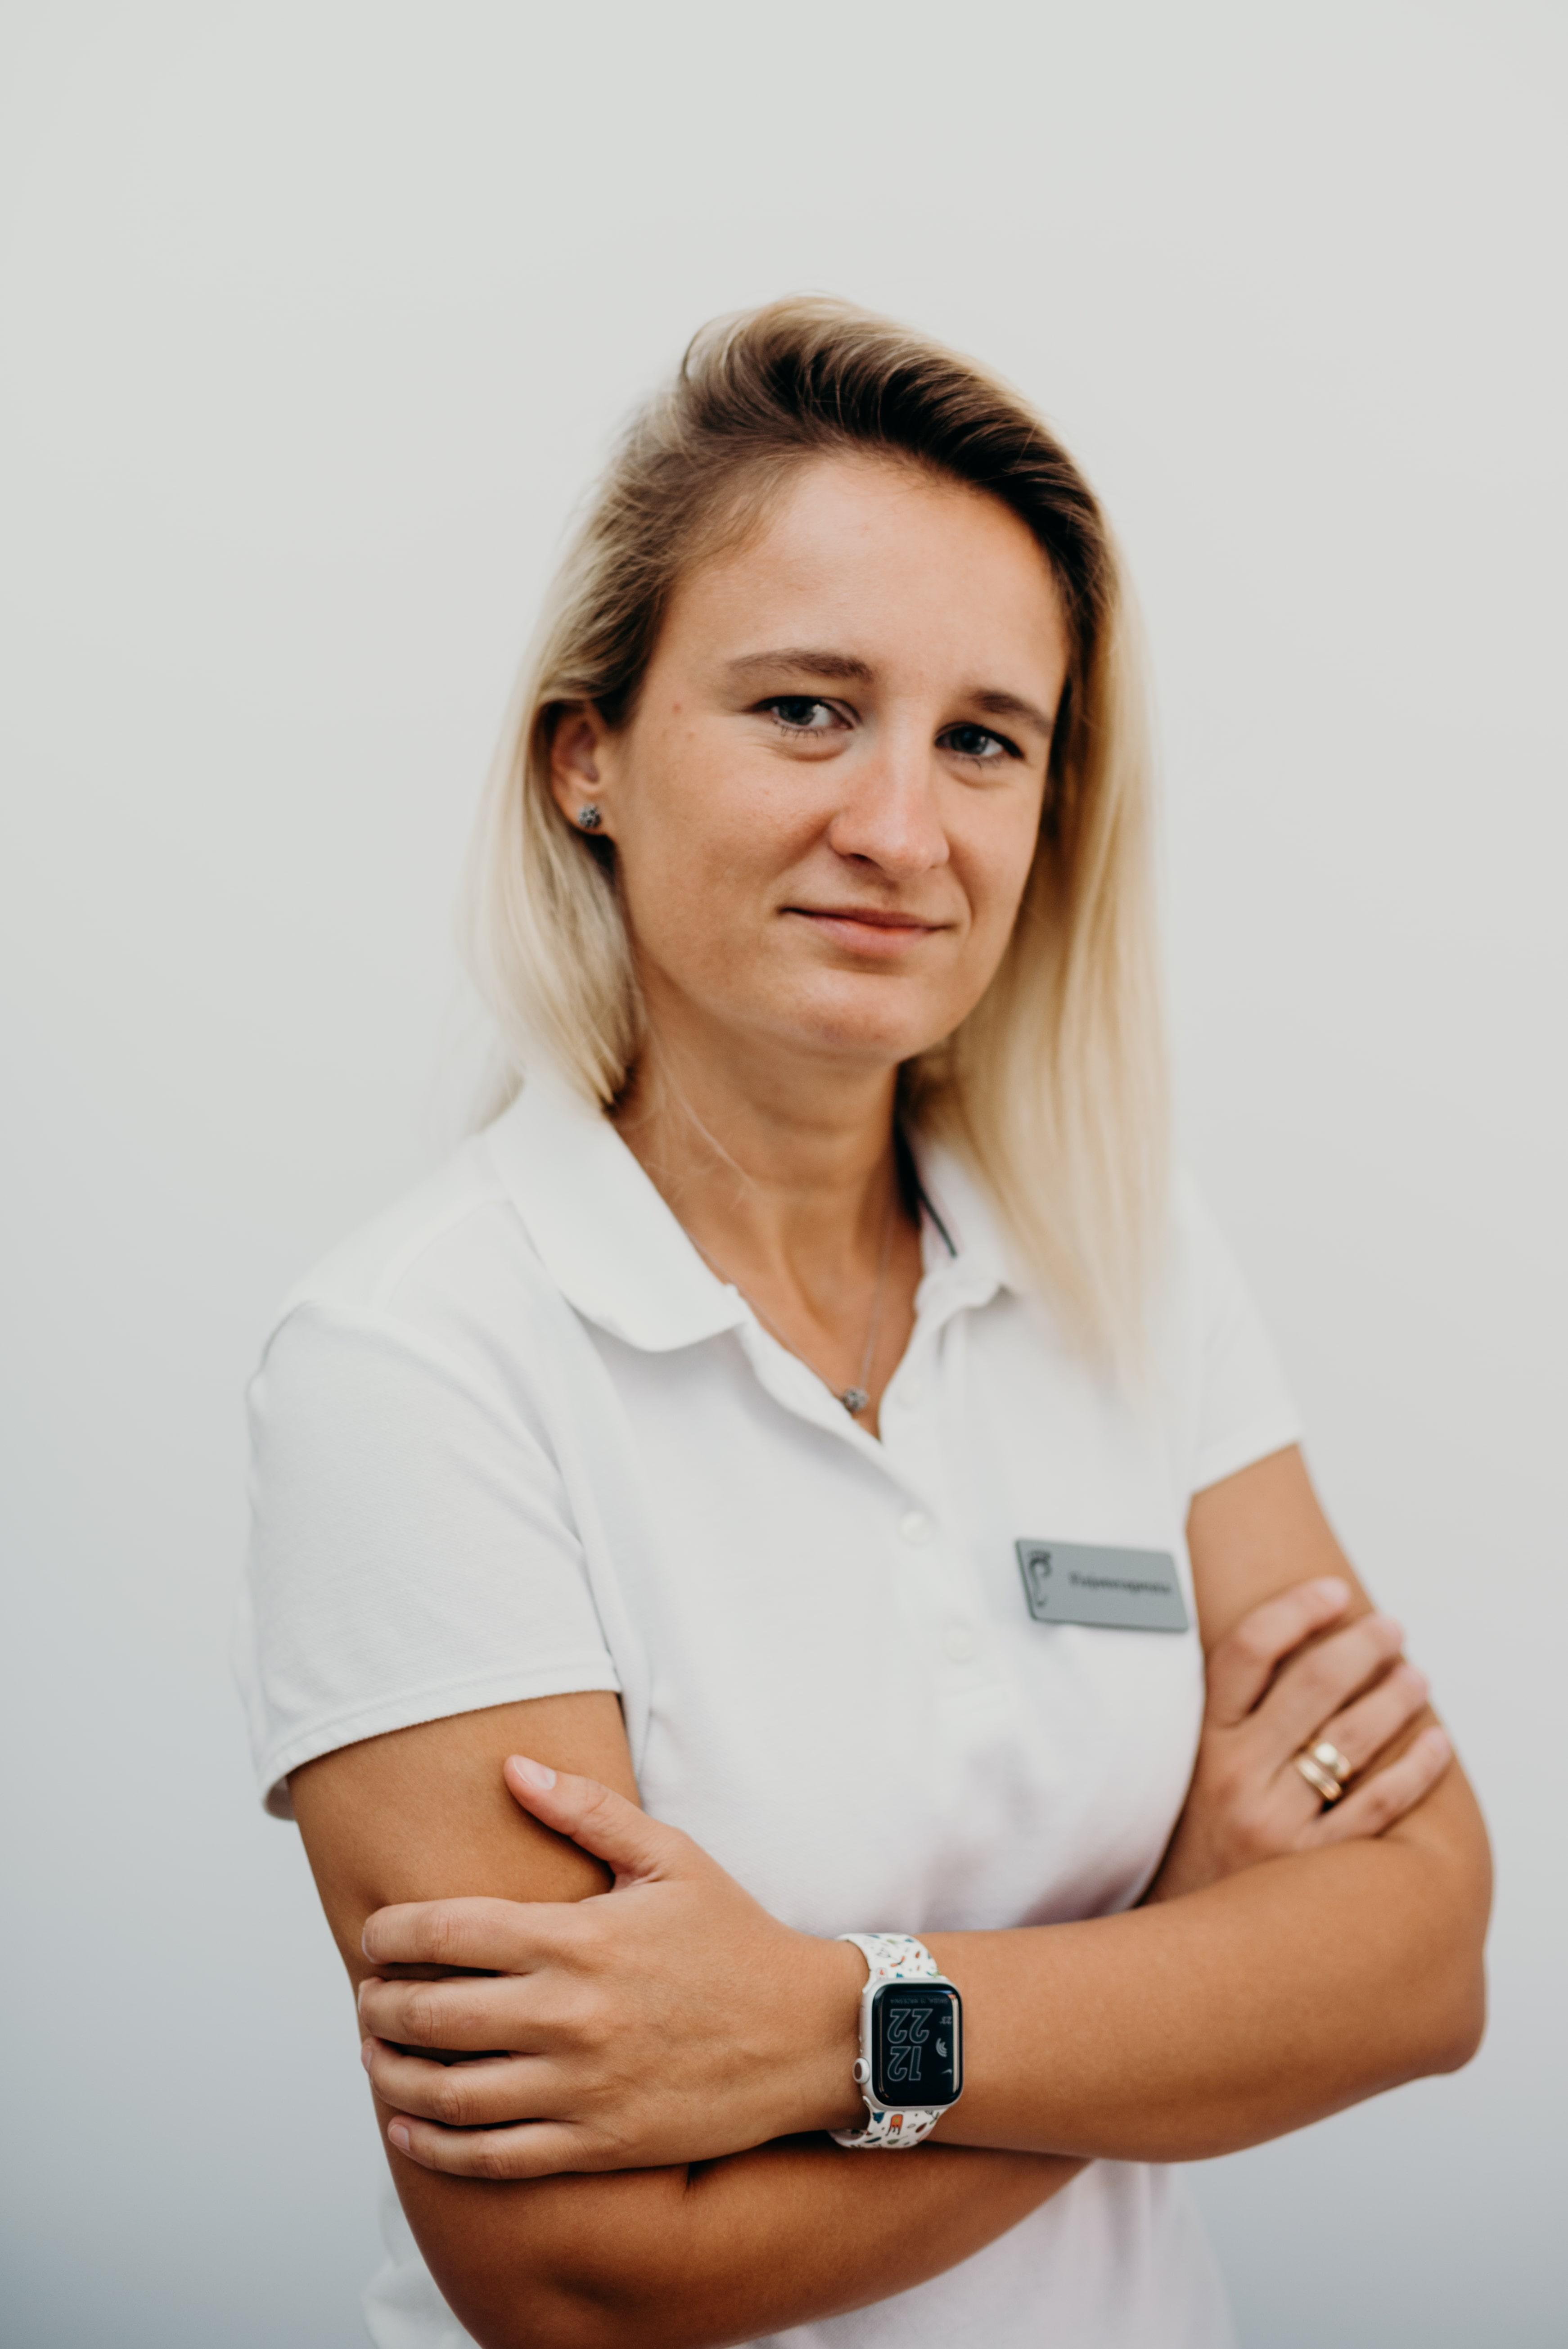 Specjalista-podolog mgr Klaudia Wilk